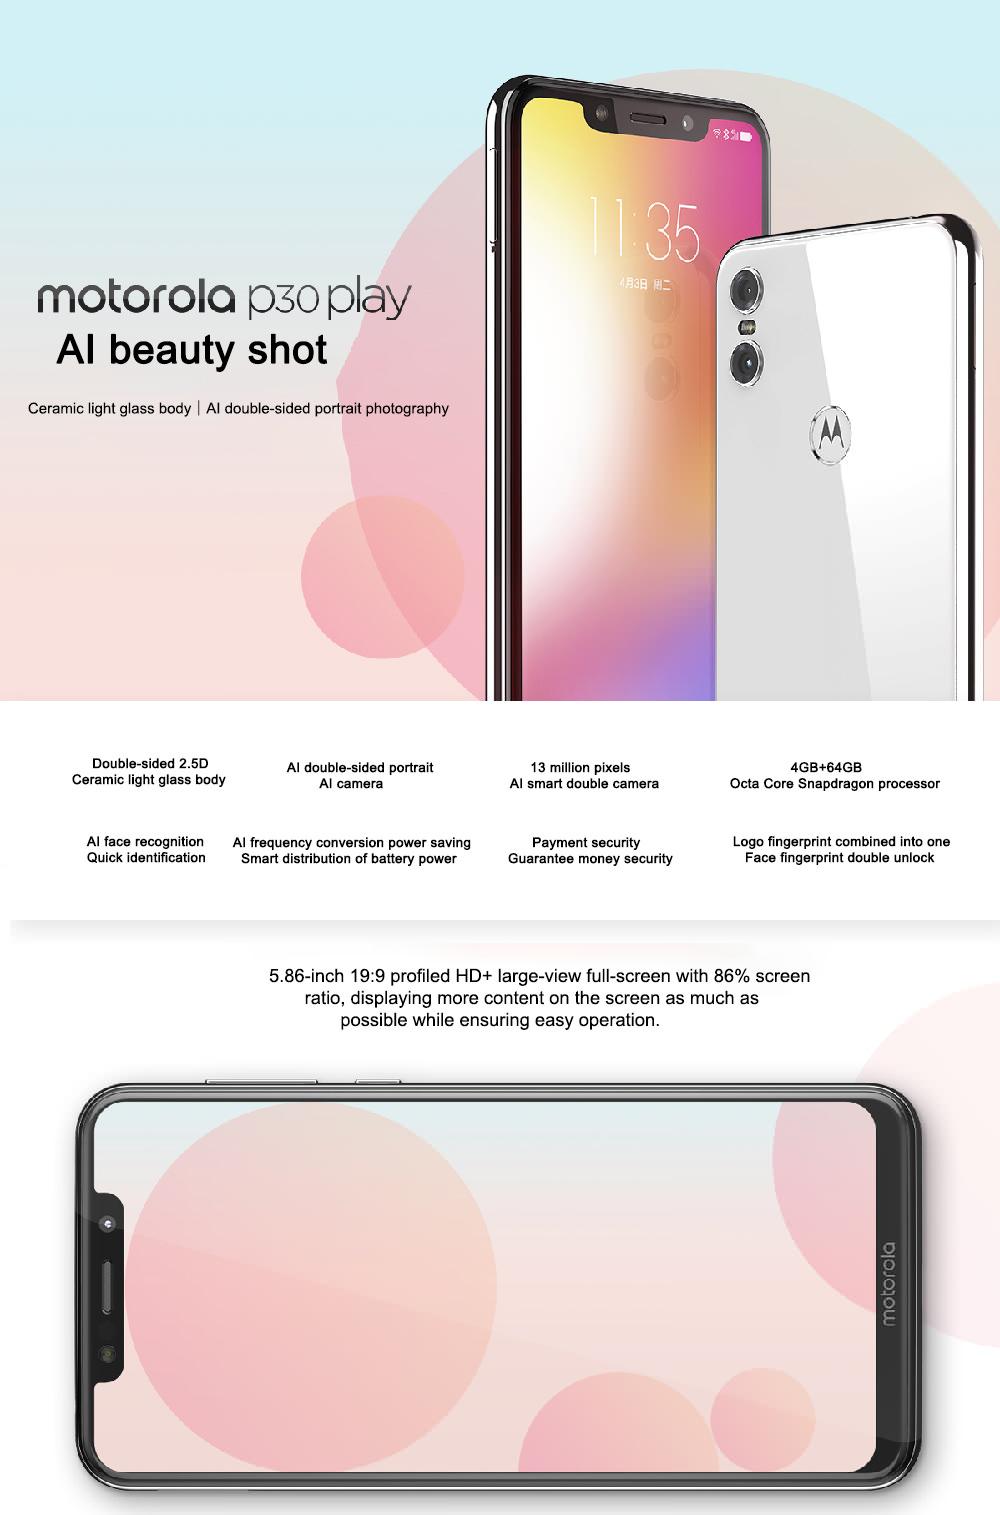 lenovo moto p30 play 4g smartphone